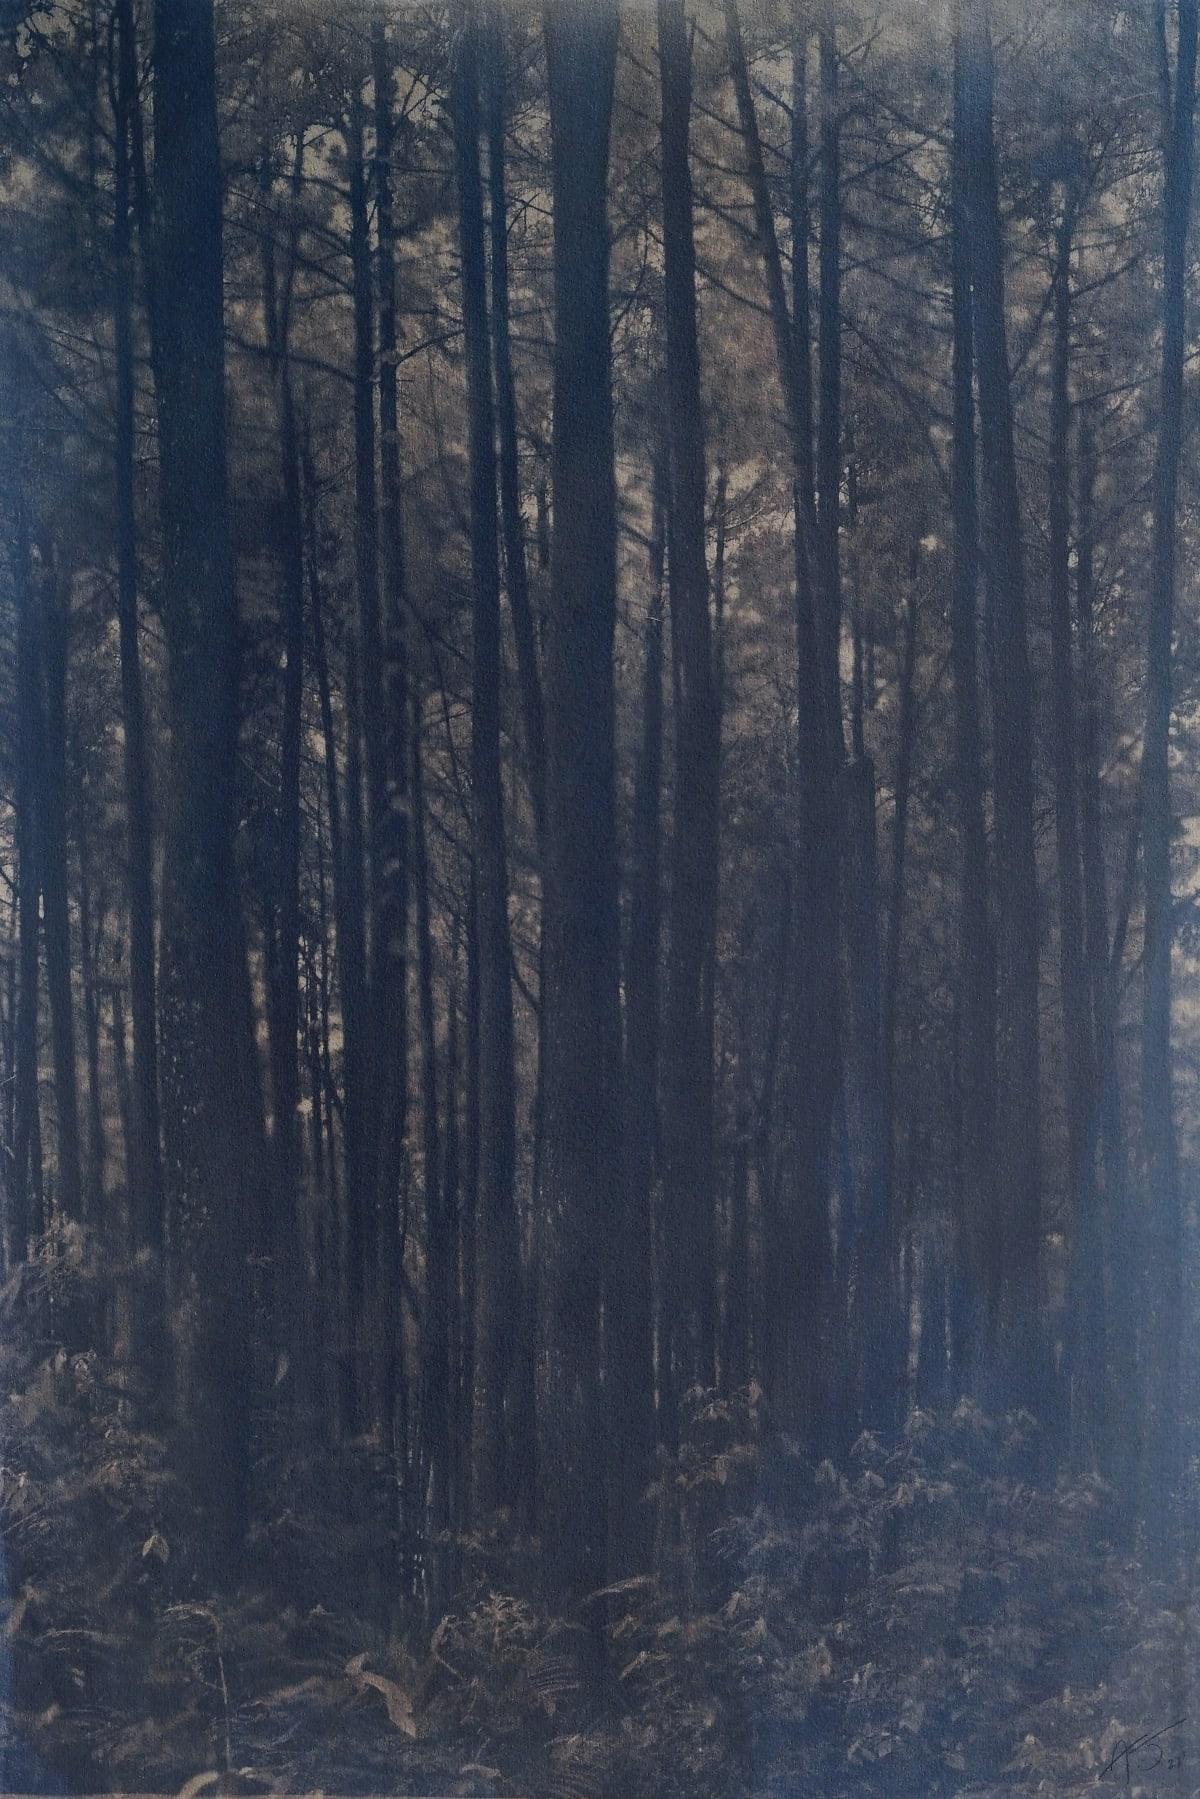 Setubuh Hutan #2, 2021